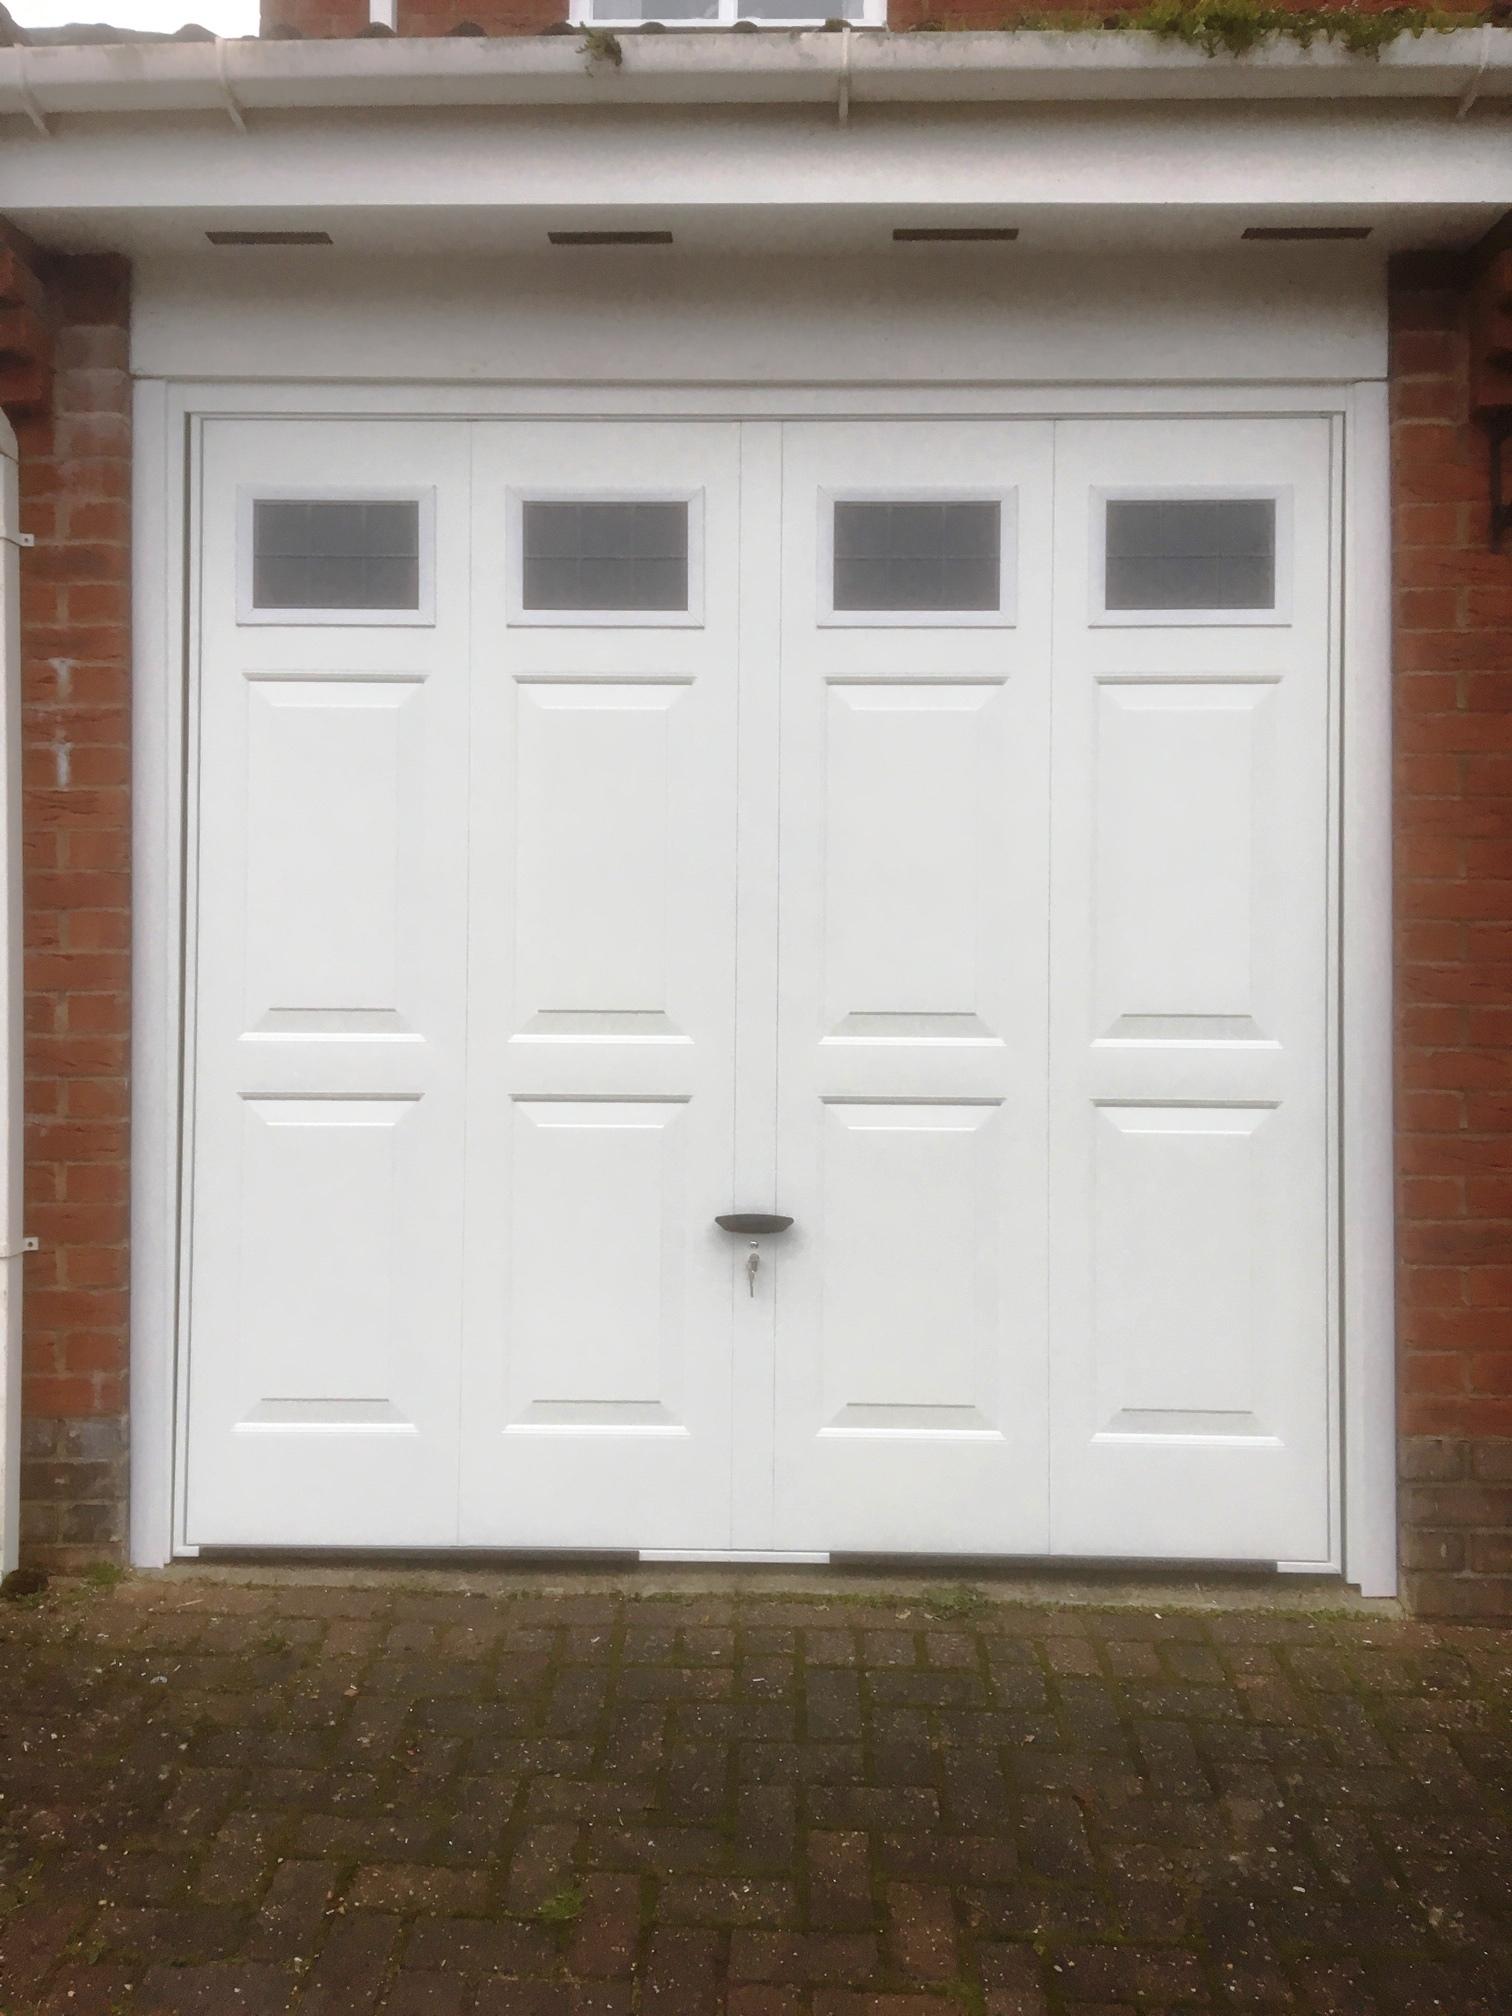 Garage door archives elite gd cardale sheraton retractable up and over garage door with glazing rubansaba